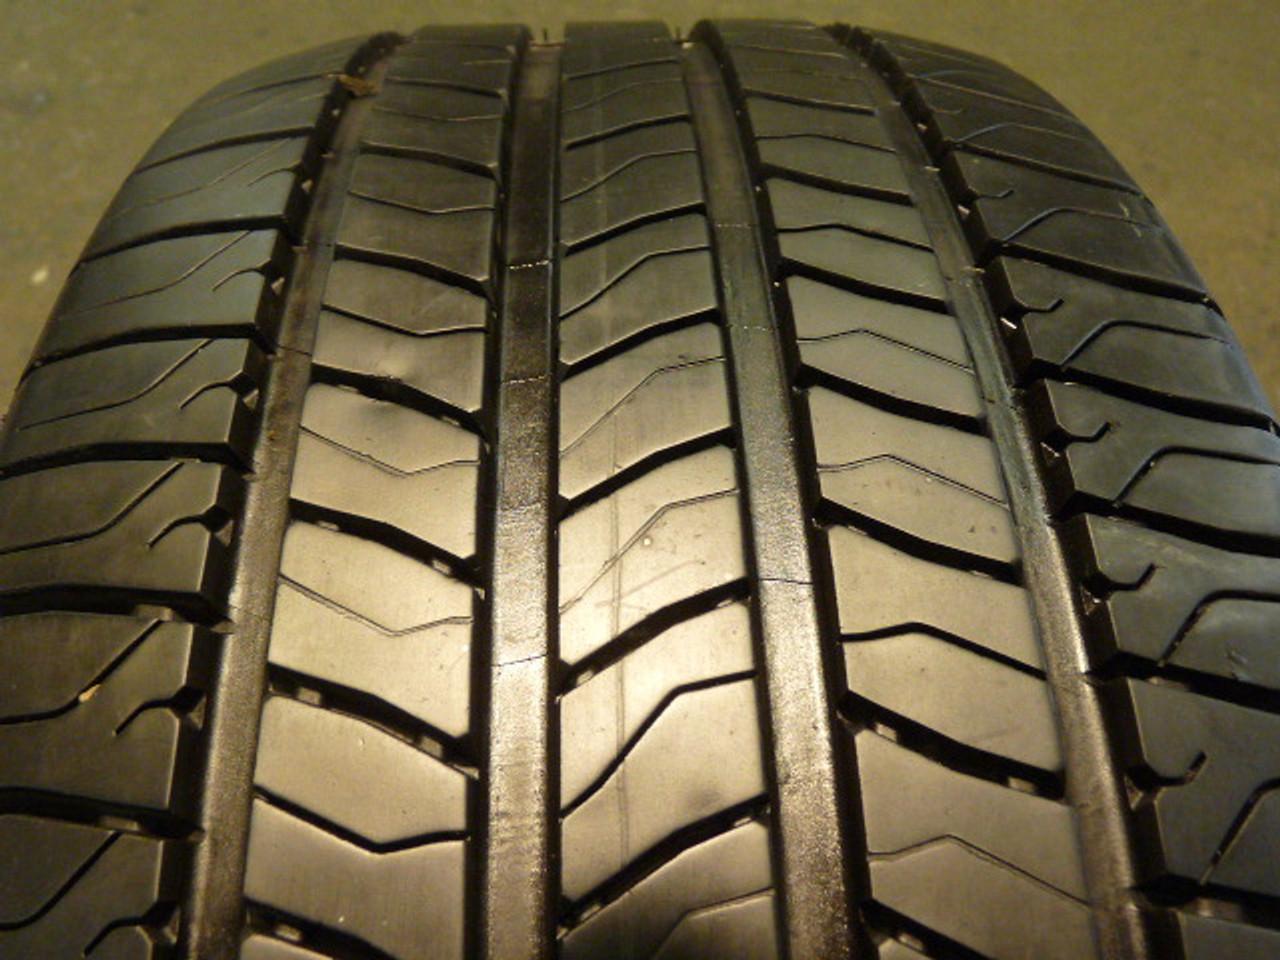 Used Take Off 225 45 17 Michelin Tire P225/45R17